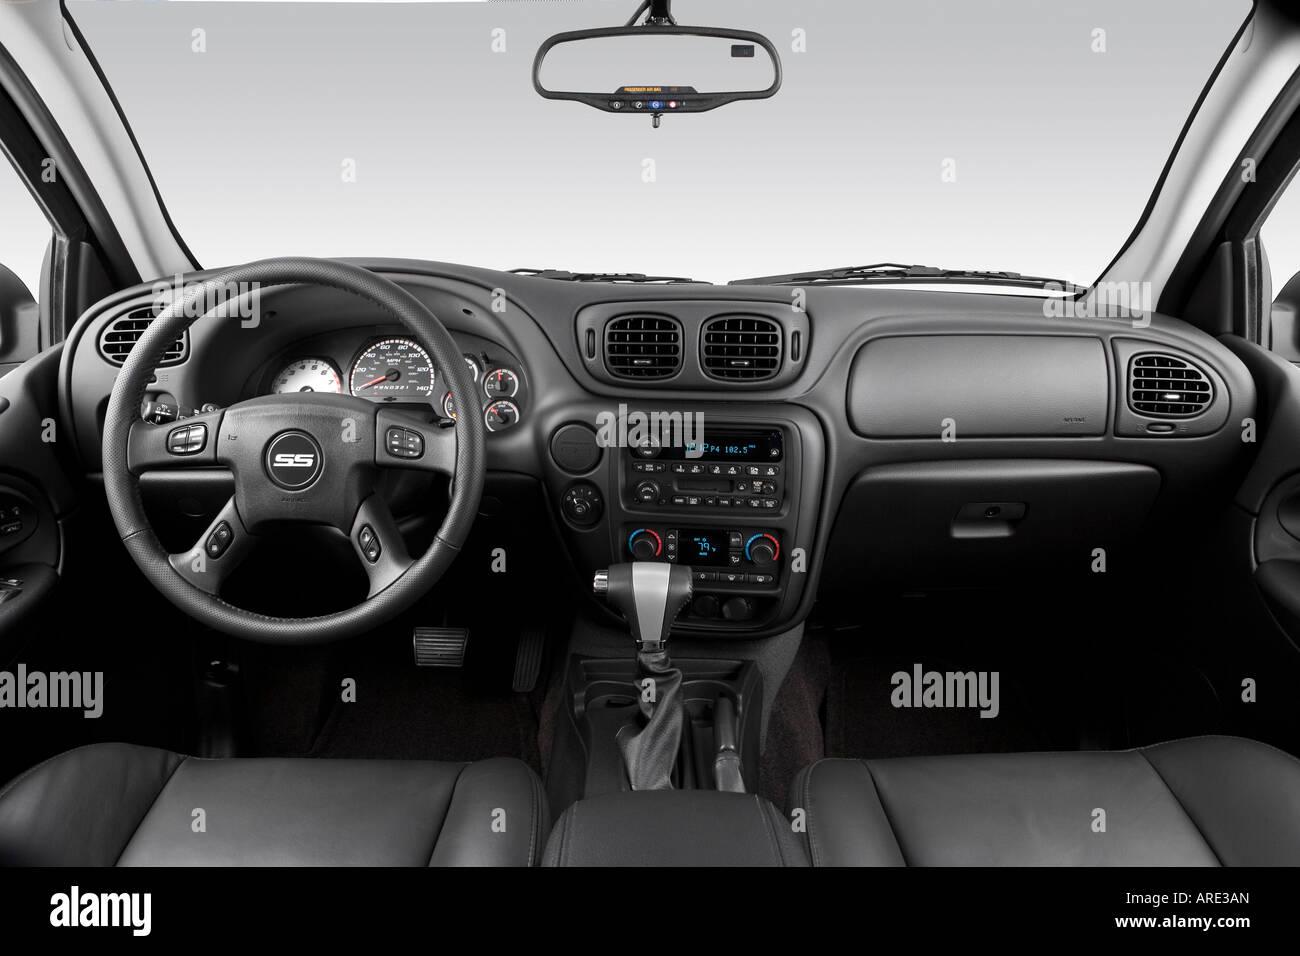 2006 Chevrolet Trailblazer SS in Black - Dashboard, center console ...